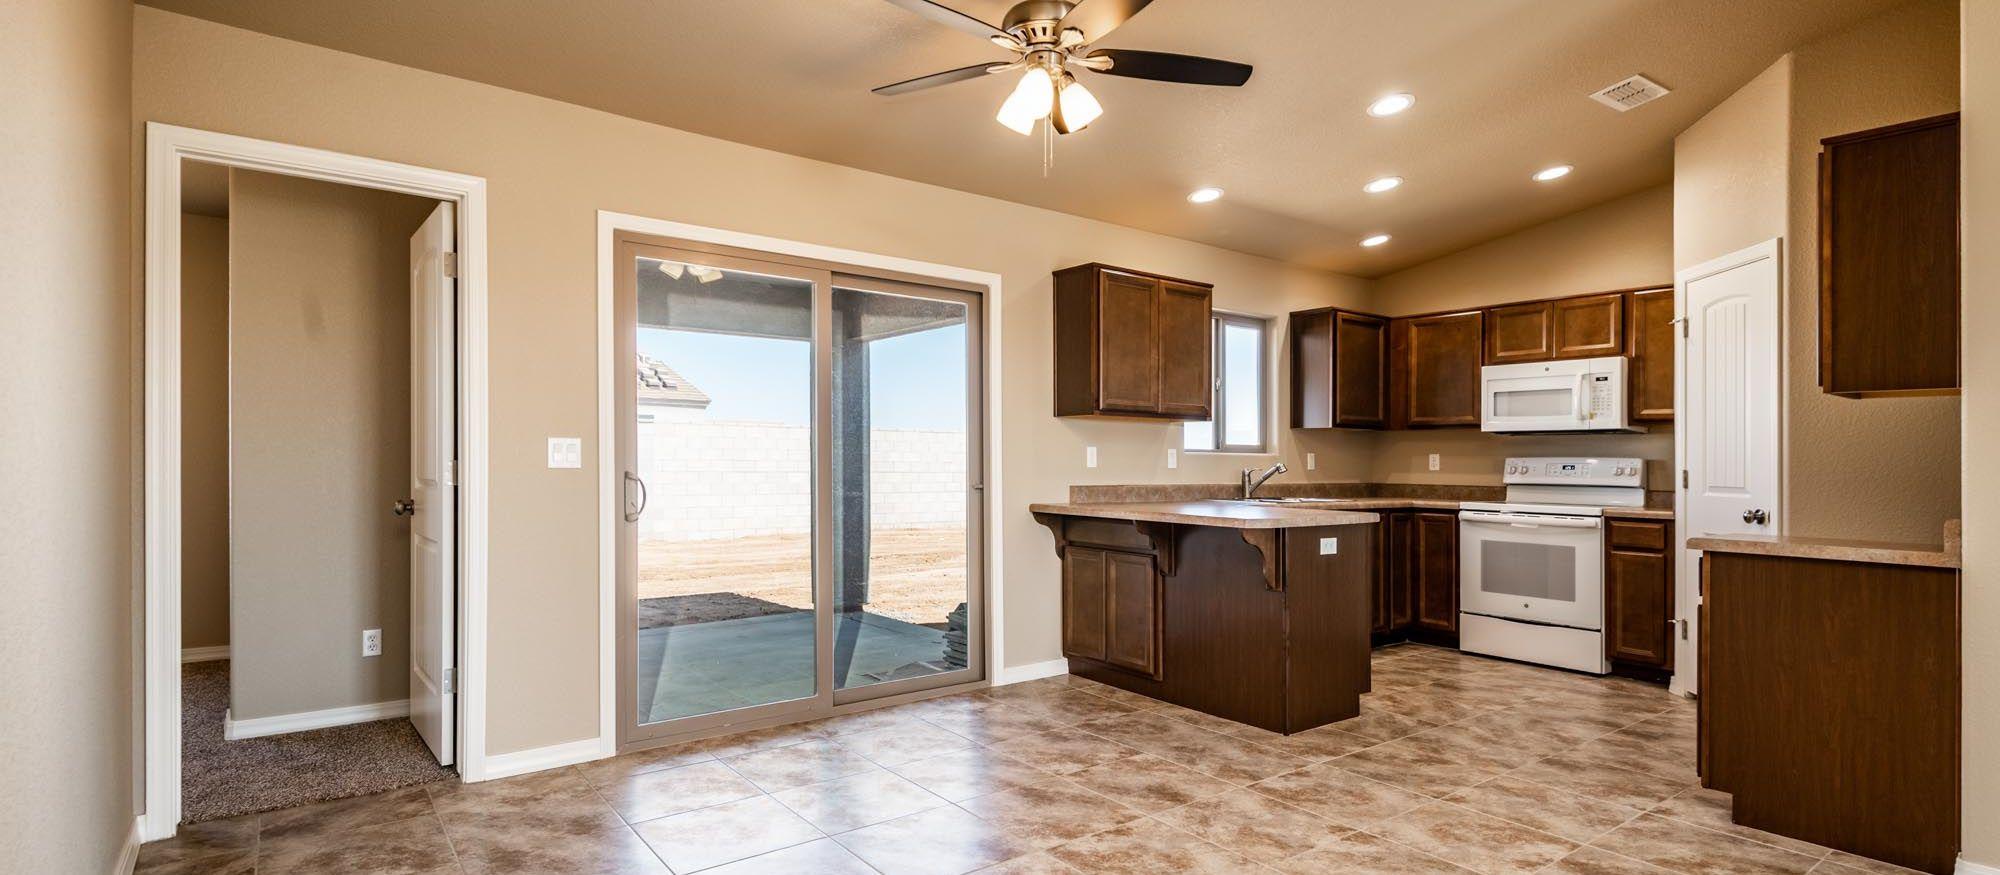 Kitchen featured in the Juniper Junior 1397 By Angle Homes in Kingman-Lake Havasu City, AZ